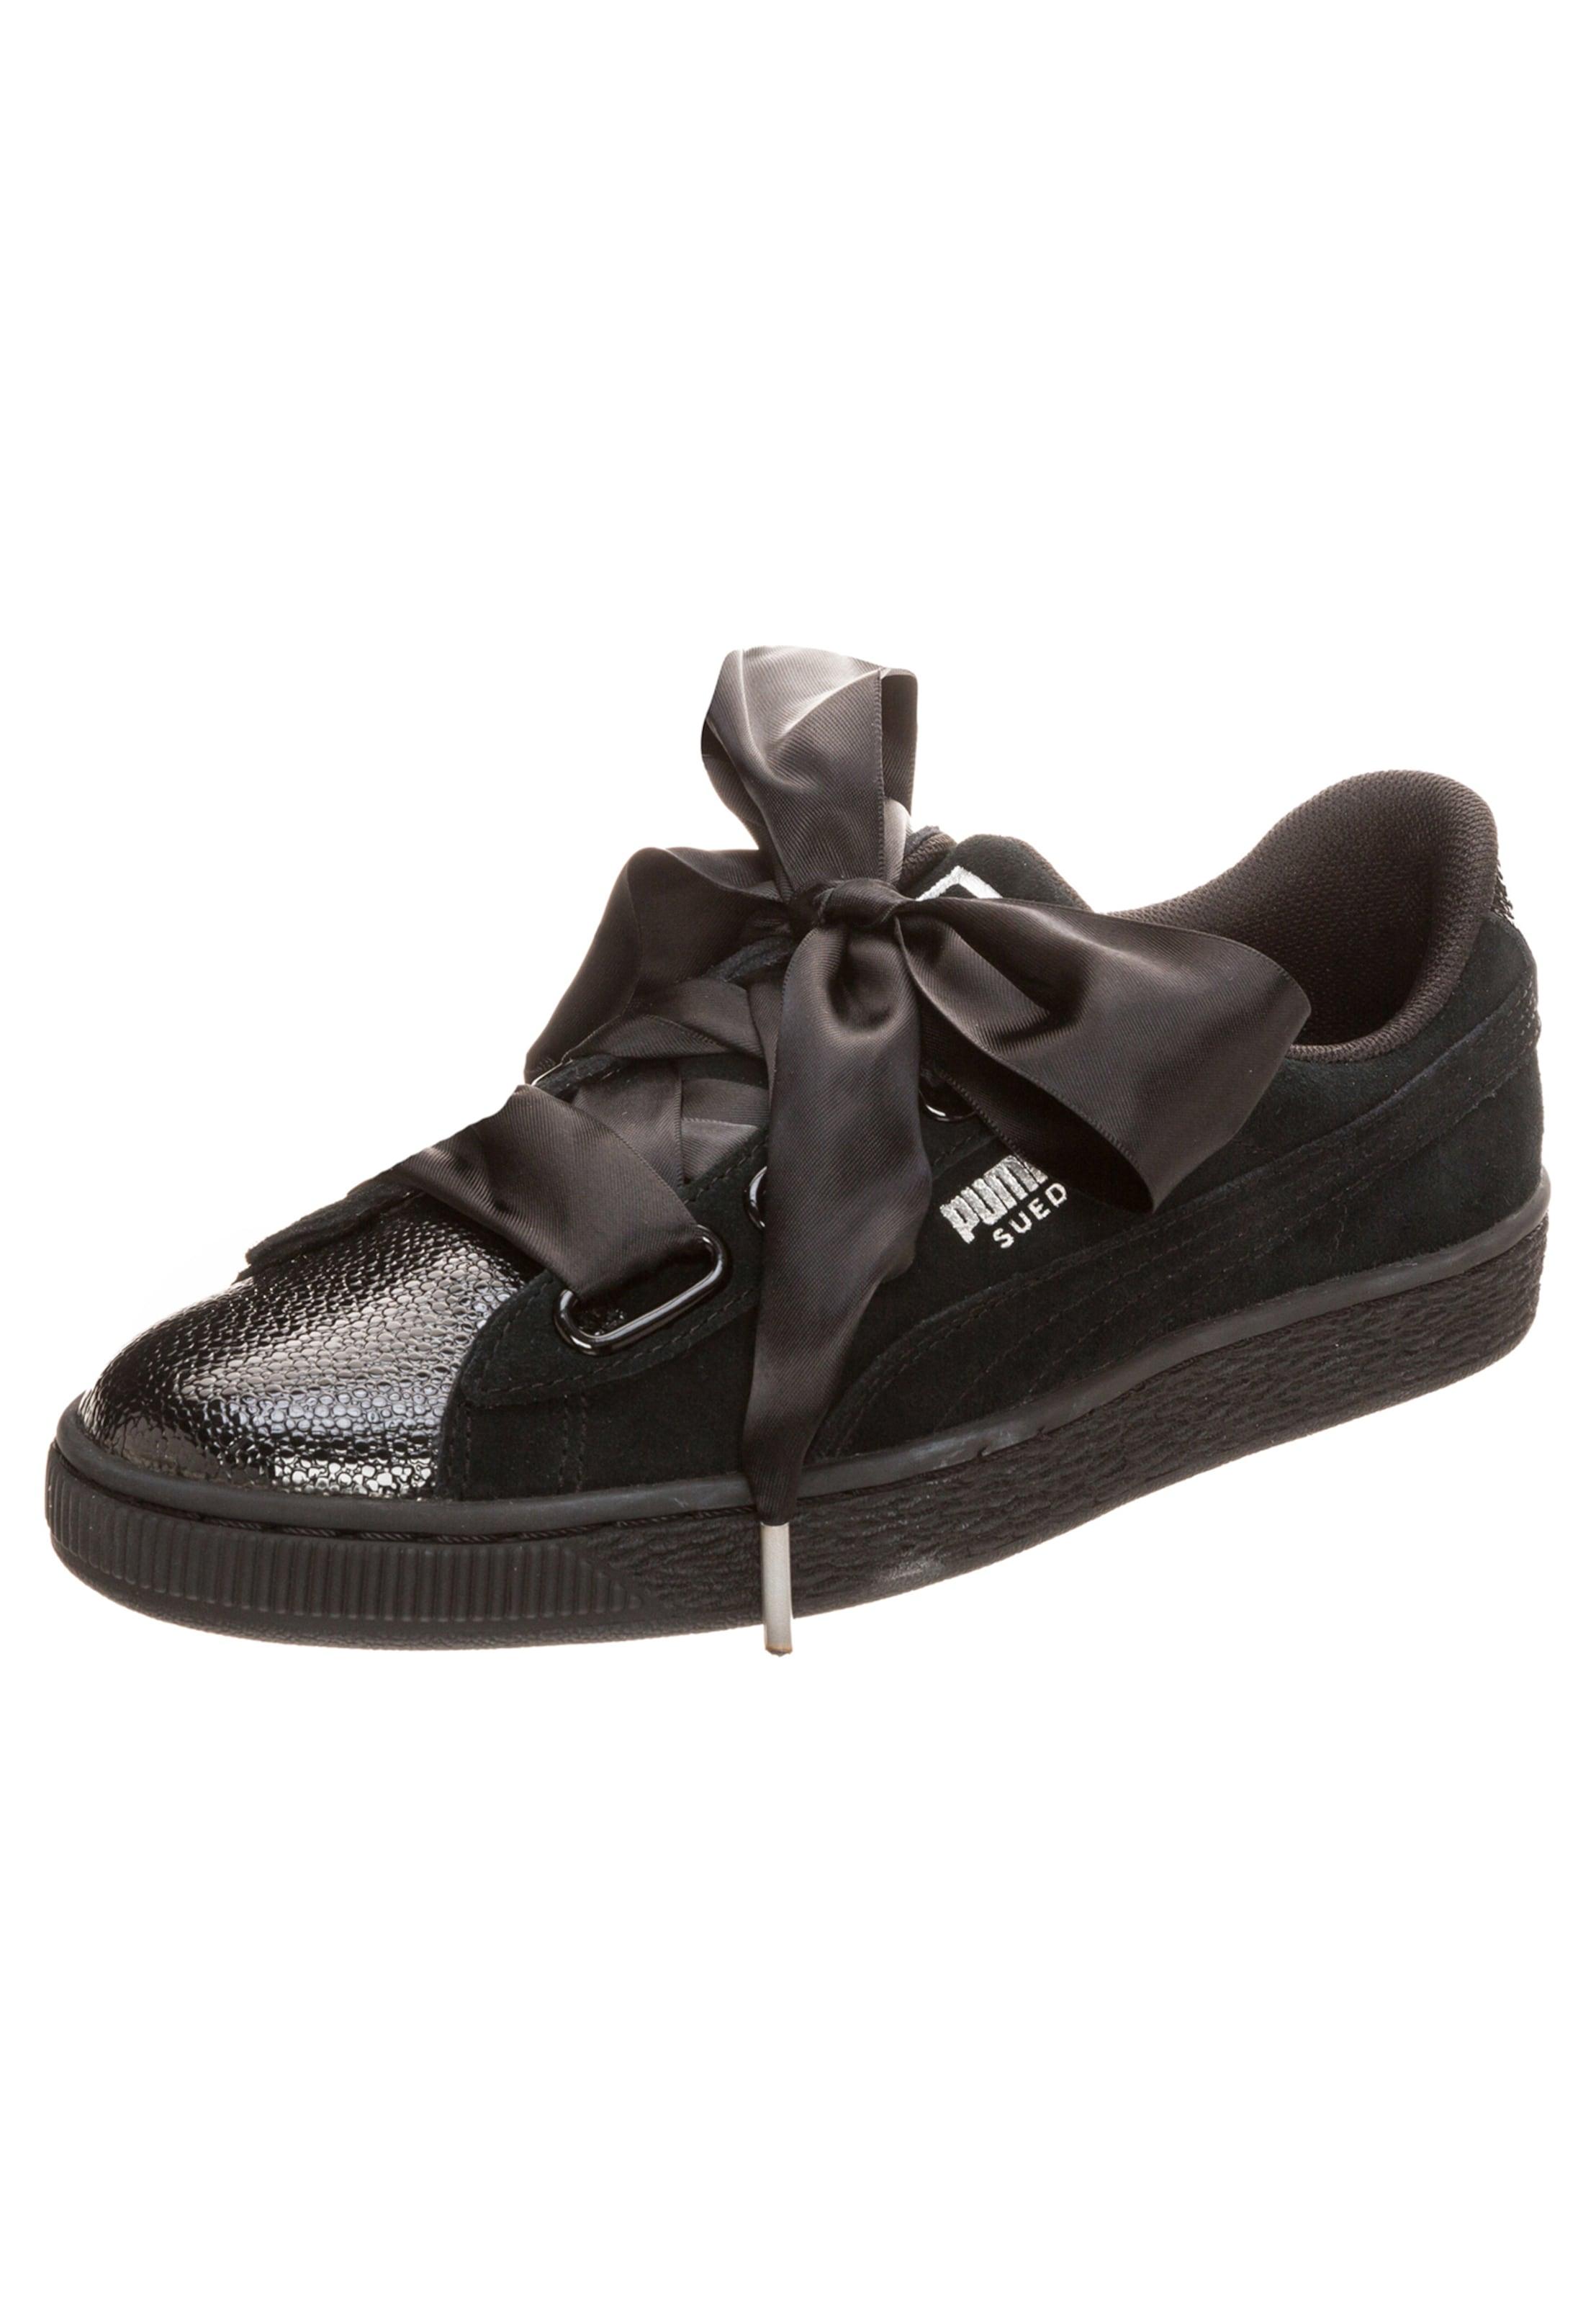 Laag Bubble' Sneakers In Zwart 'suede Heart Puma 5wz8Cx6q6